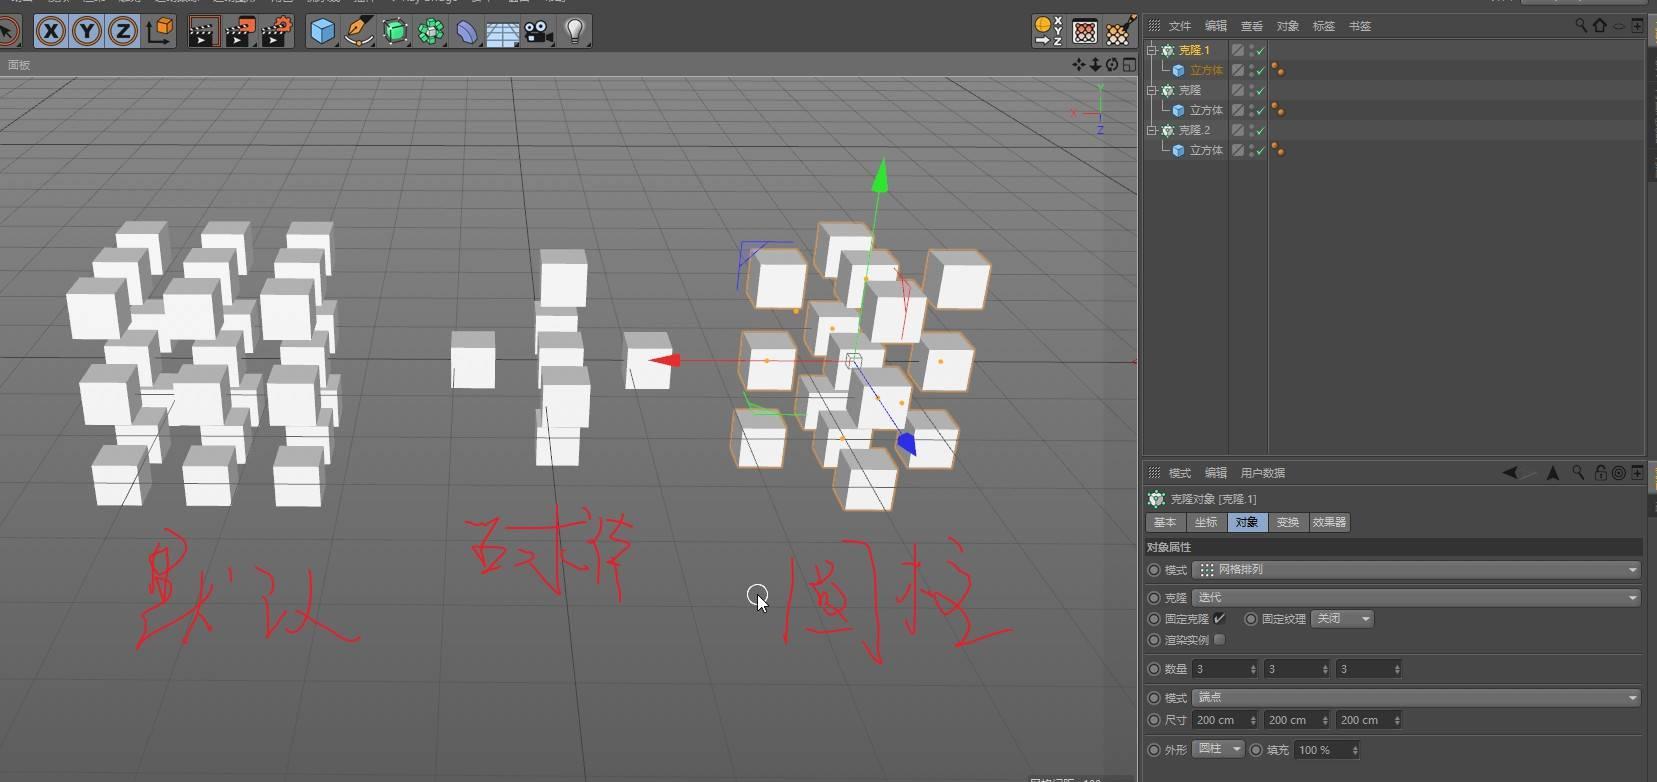 CINEMA 4D入门 (69):C4D 运动图形 – 克隆工具 之 网格克隆 - R站|学习使我快乐! - 2